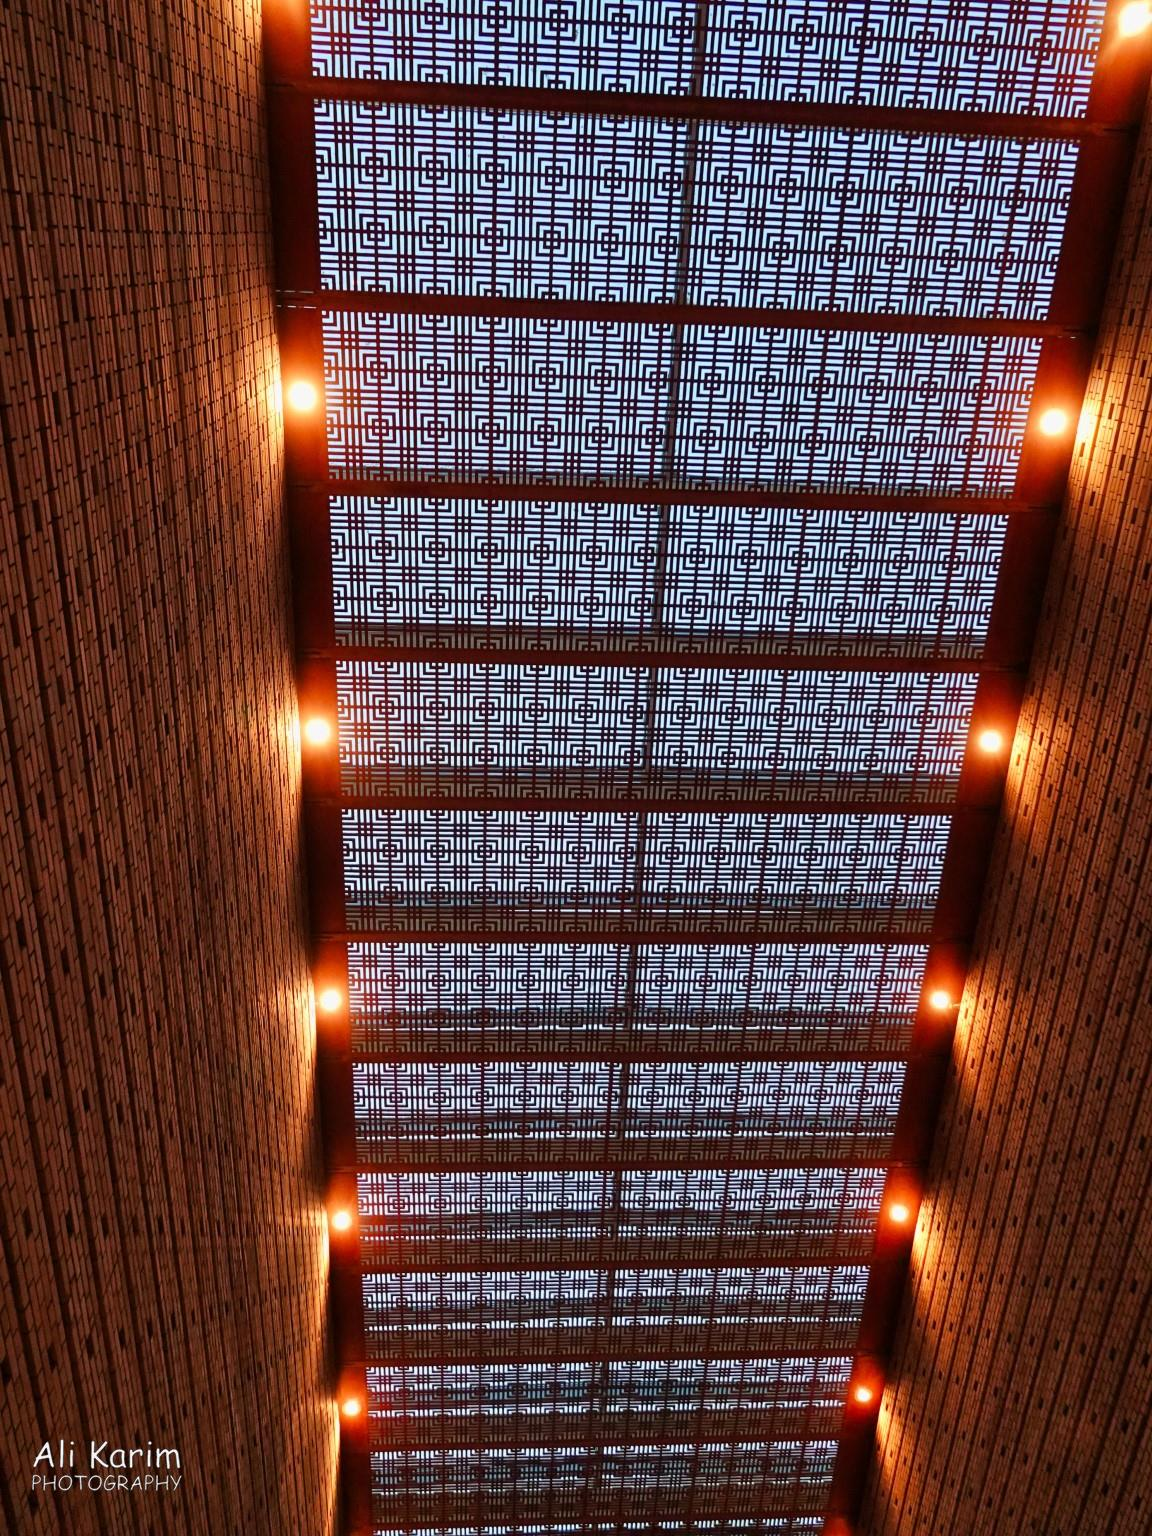 Dushanbe, Tajikistan Interesting ceiling design